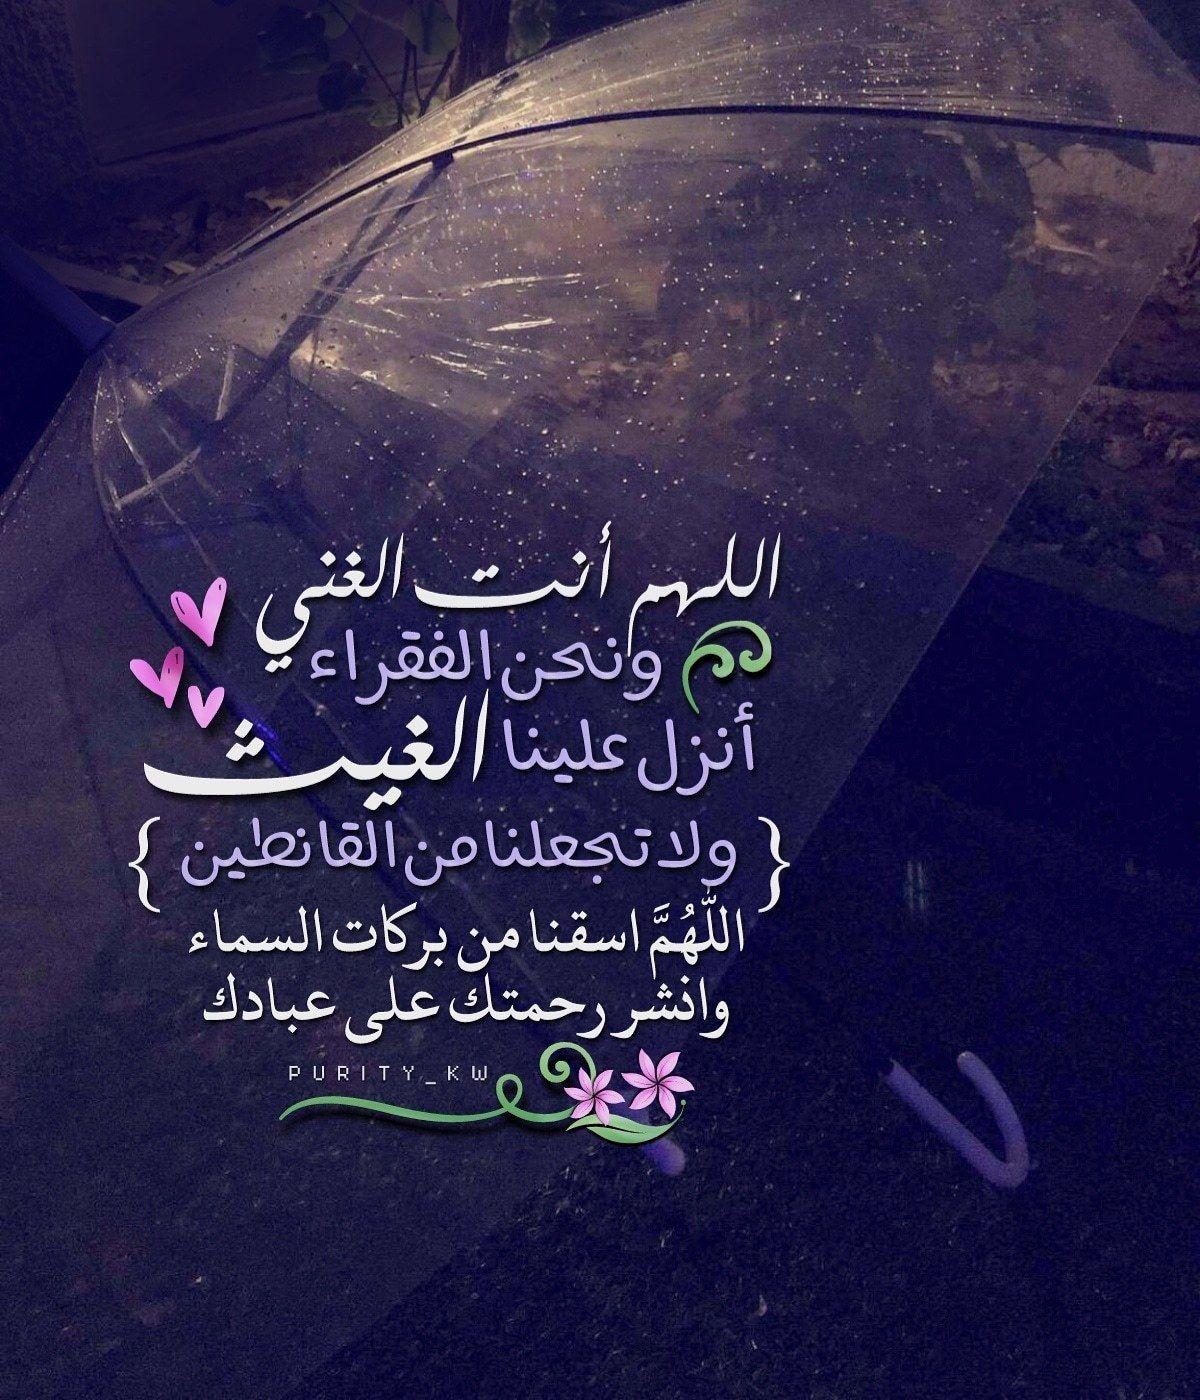 كويتية وكل ما انشره من تصميمي Art Quotes Quran Quotes Islamic Quotes